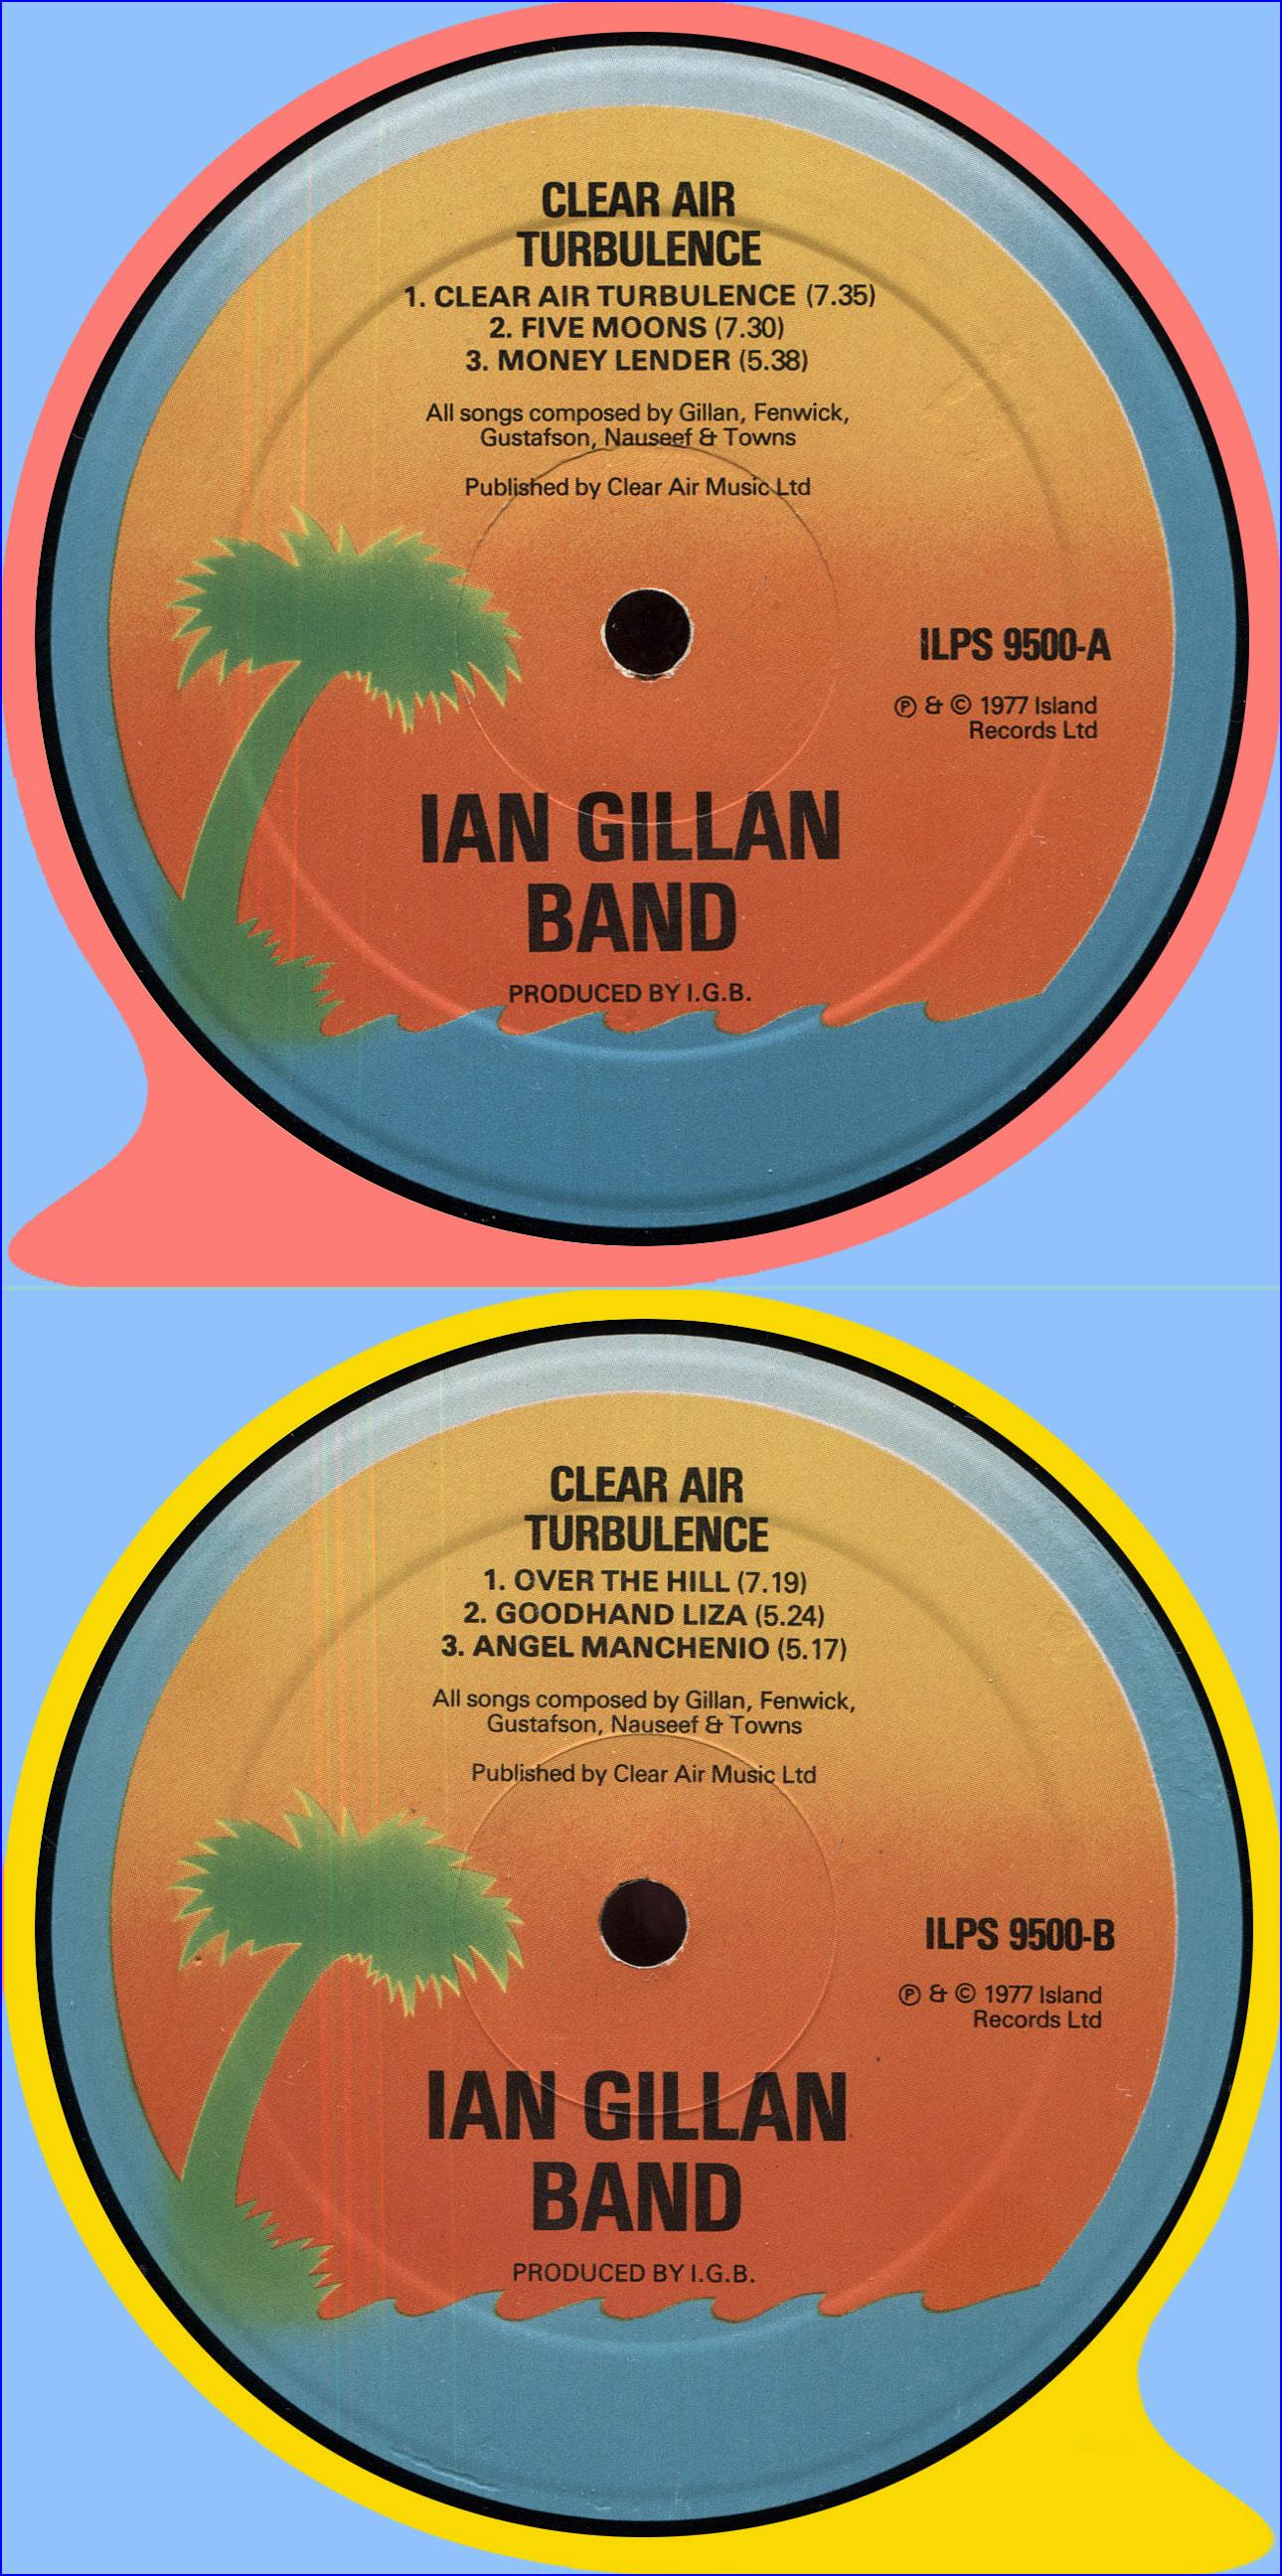 IanGillanBand77ClearAir_label.jpg